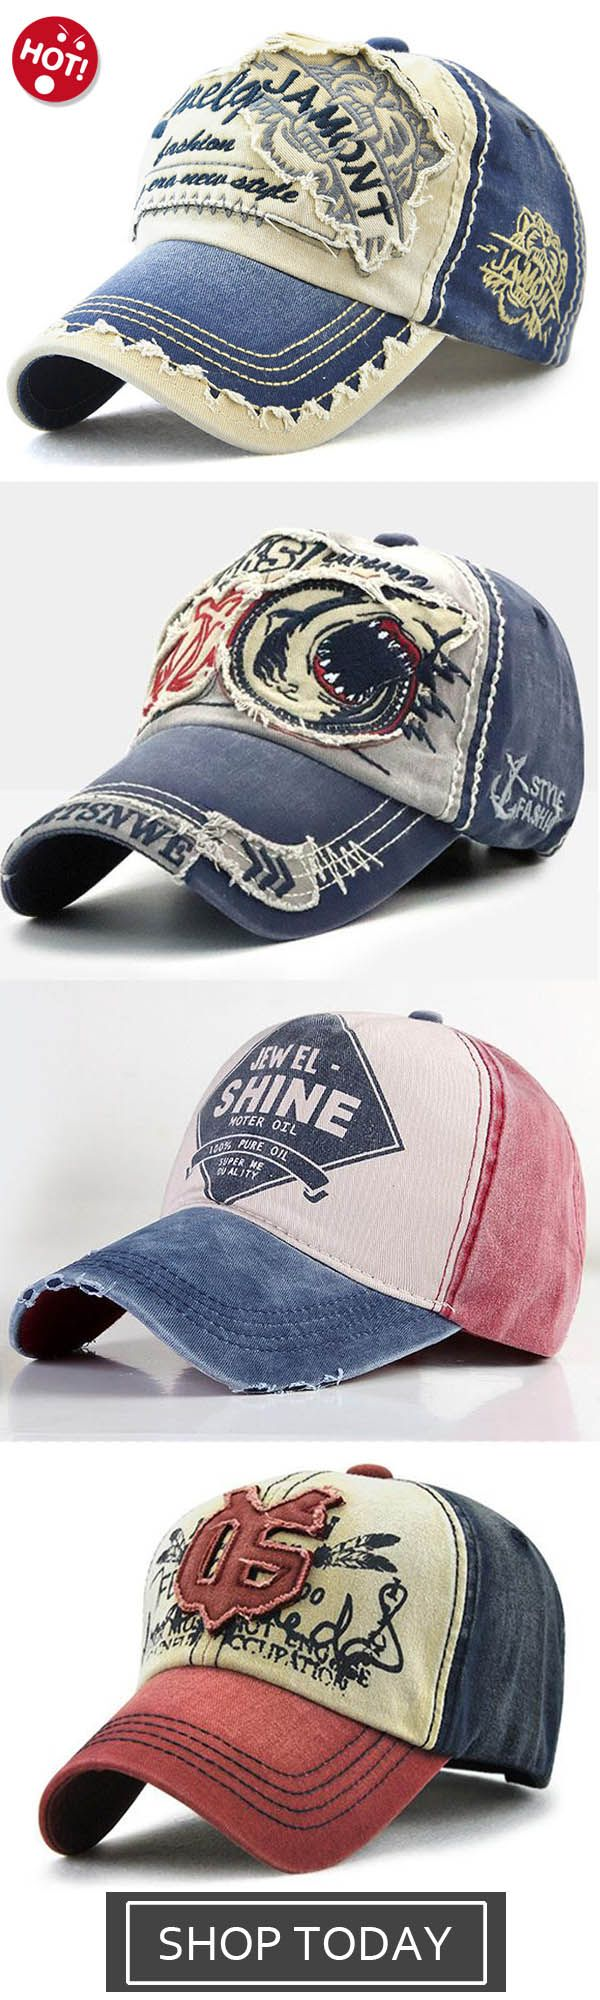 6eb201ead2e94d Men Vintage Patch Embroidered Letter Sunshade Hat Baseball Caps,Washed Baseball  Cap Fashion Shark Peaked